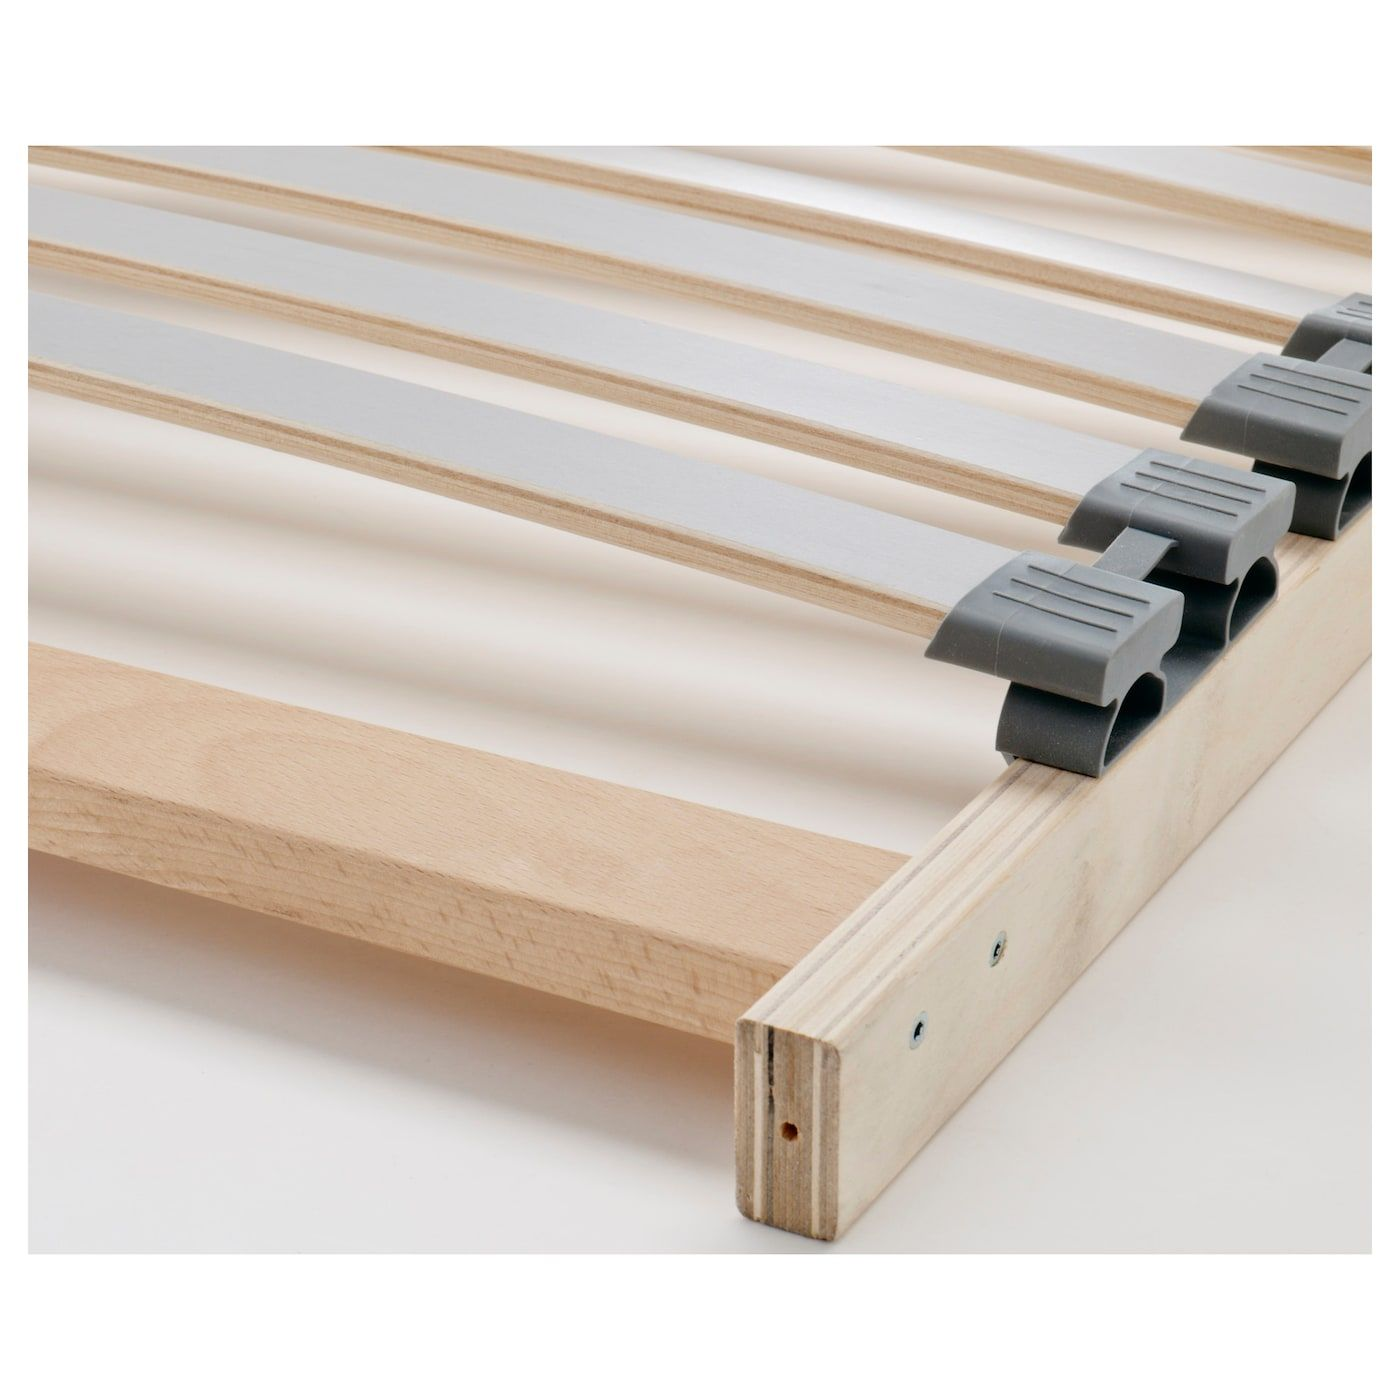 Lonset Slatted Bed Base Queen Bed Frame With Storage Bed Slats